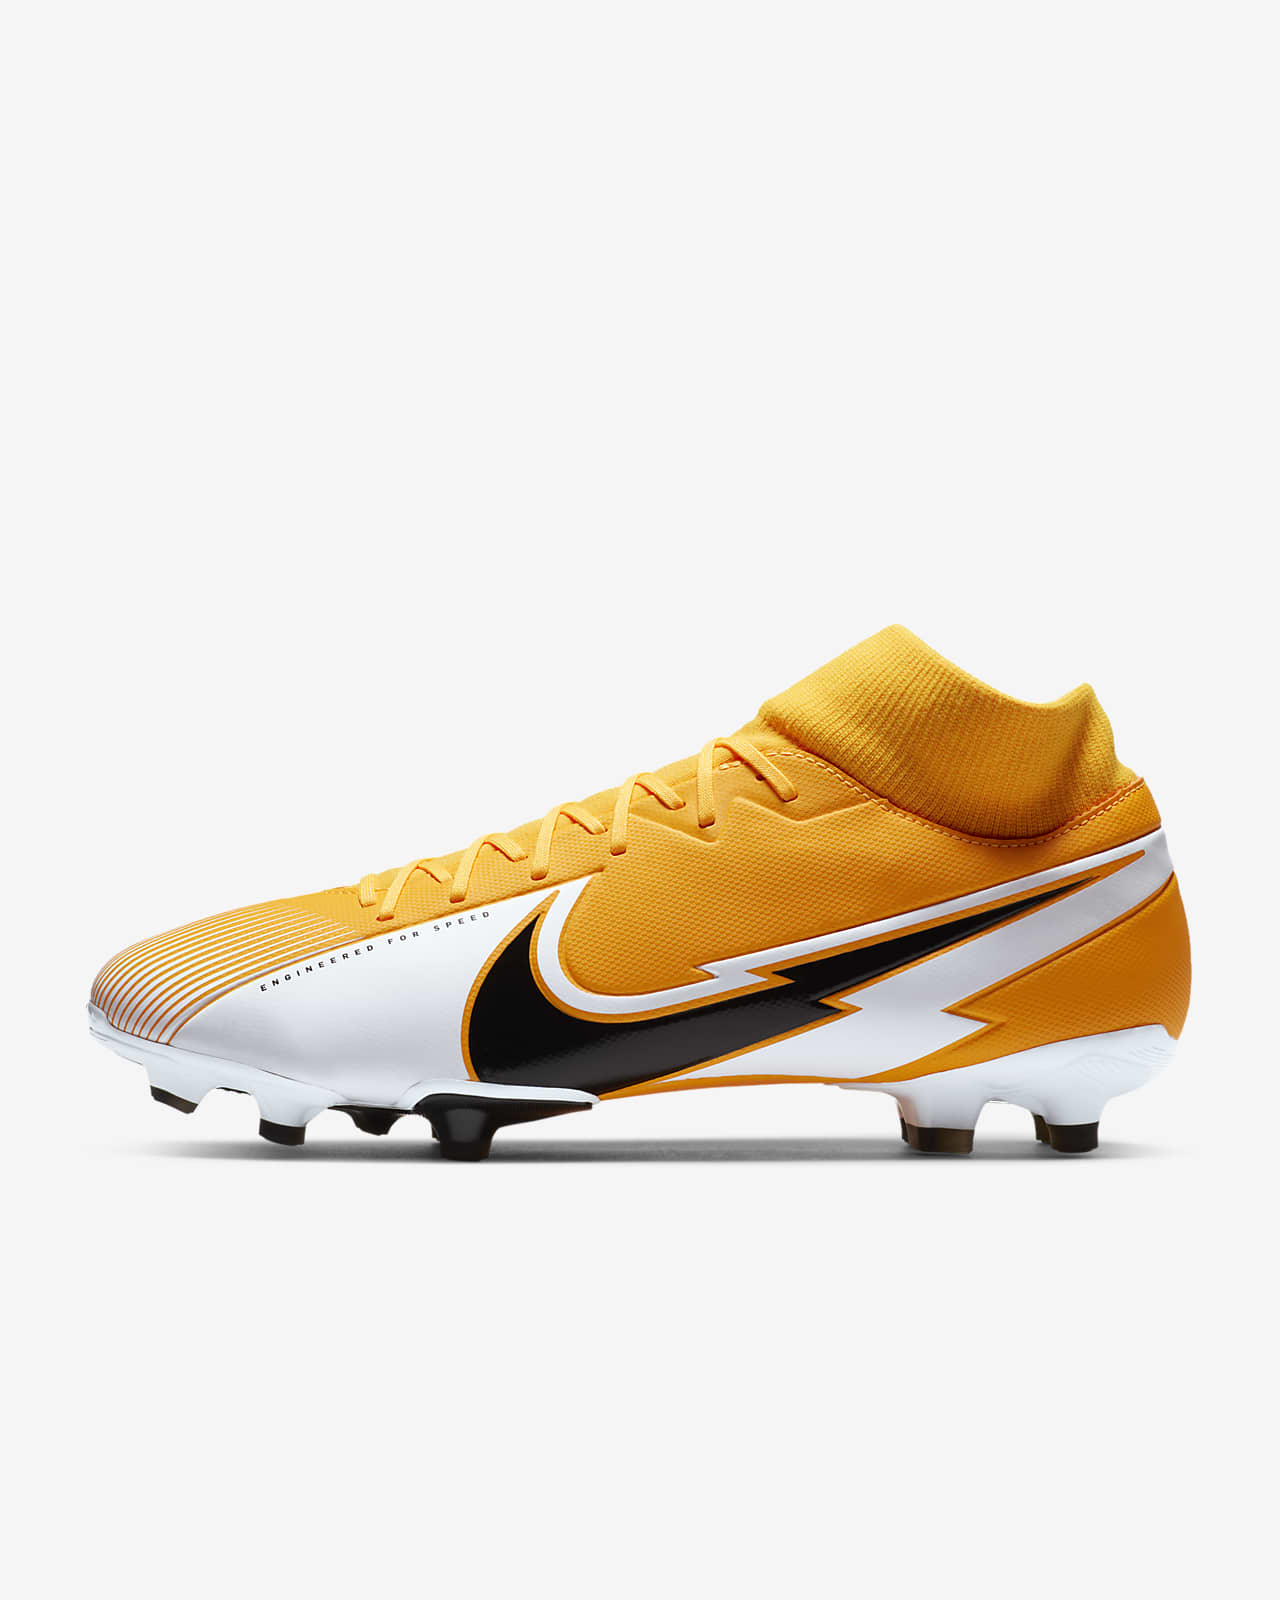 Violín considerado Amado  Nike Mercurial Superfly 7 Academy MG Multi-Ground Football Boot. Nike IN